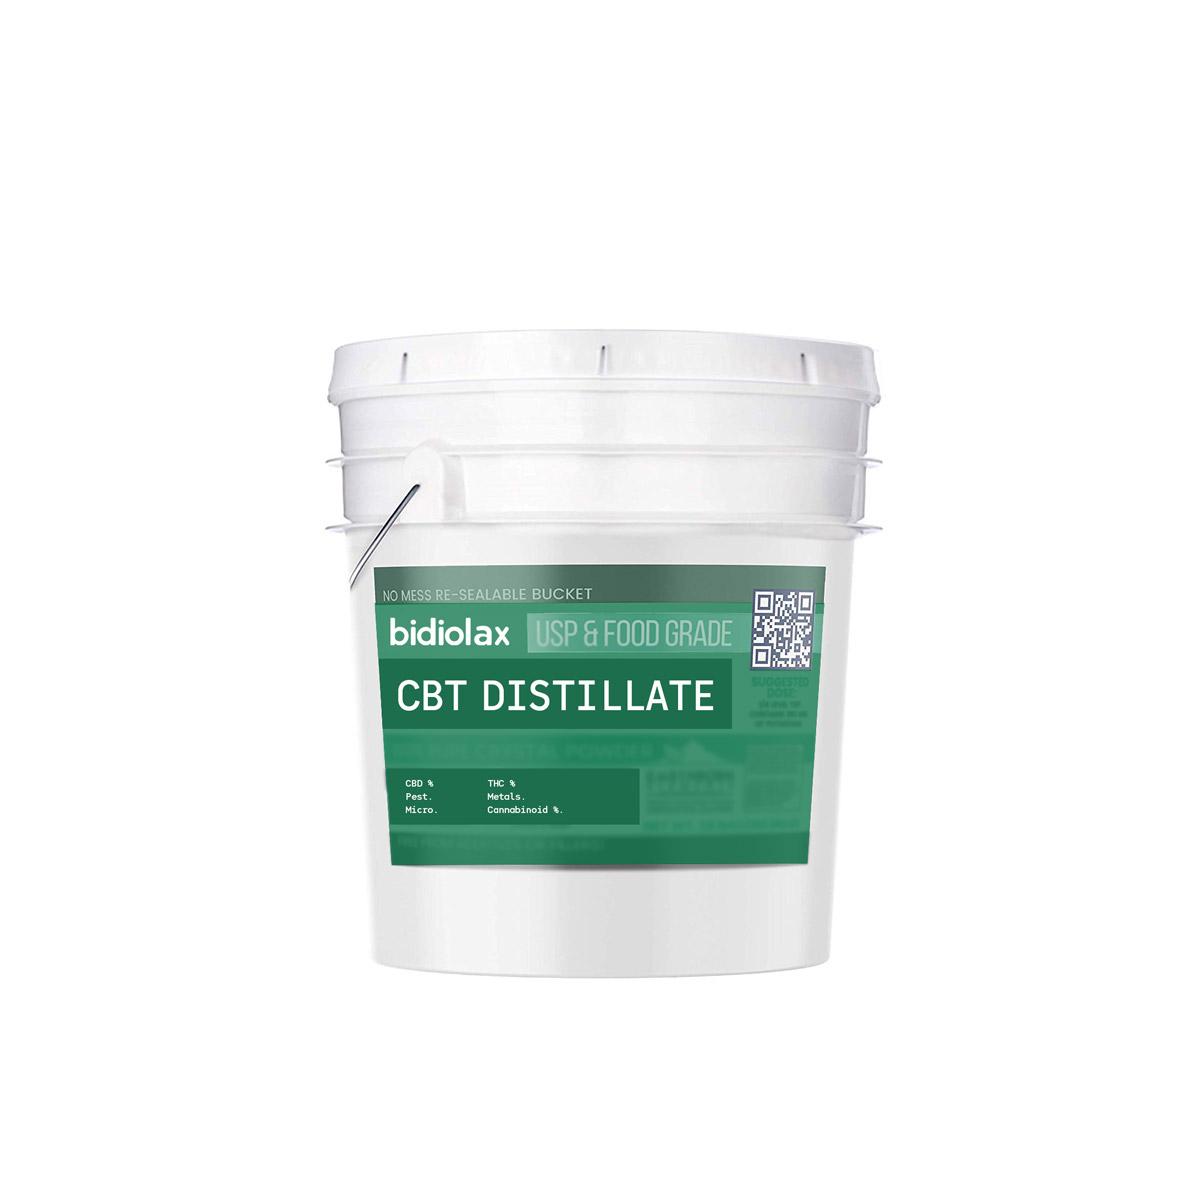 CBT Distillate